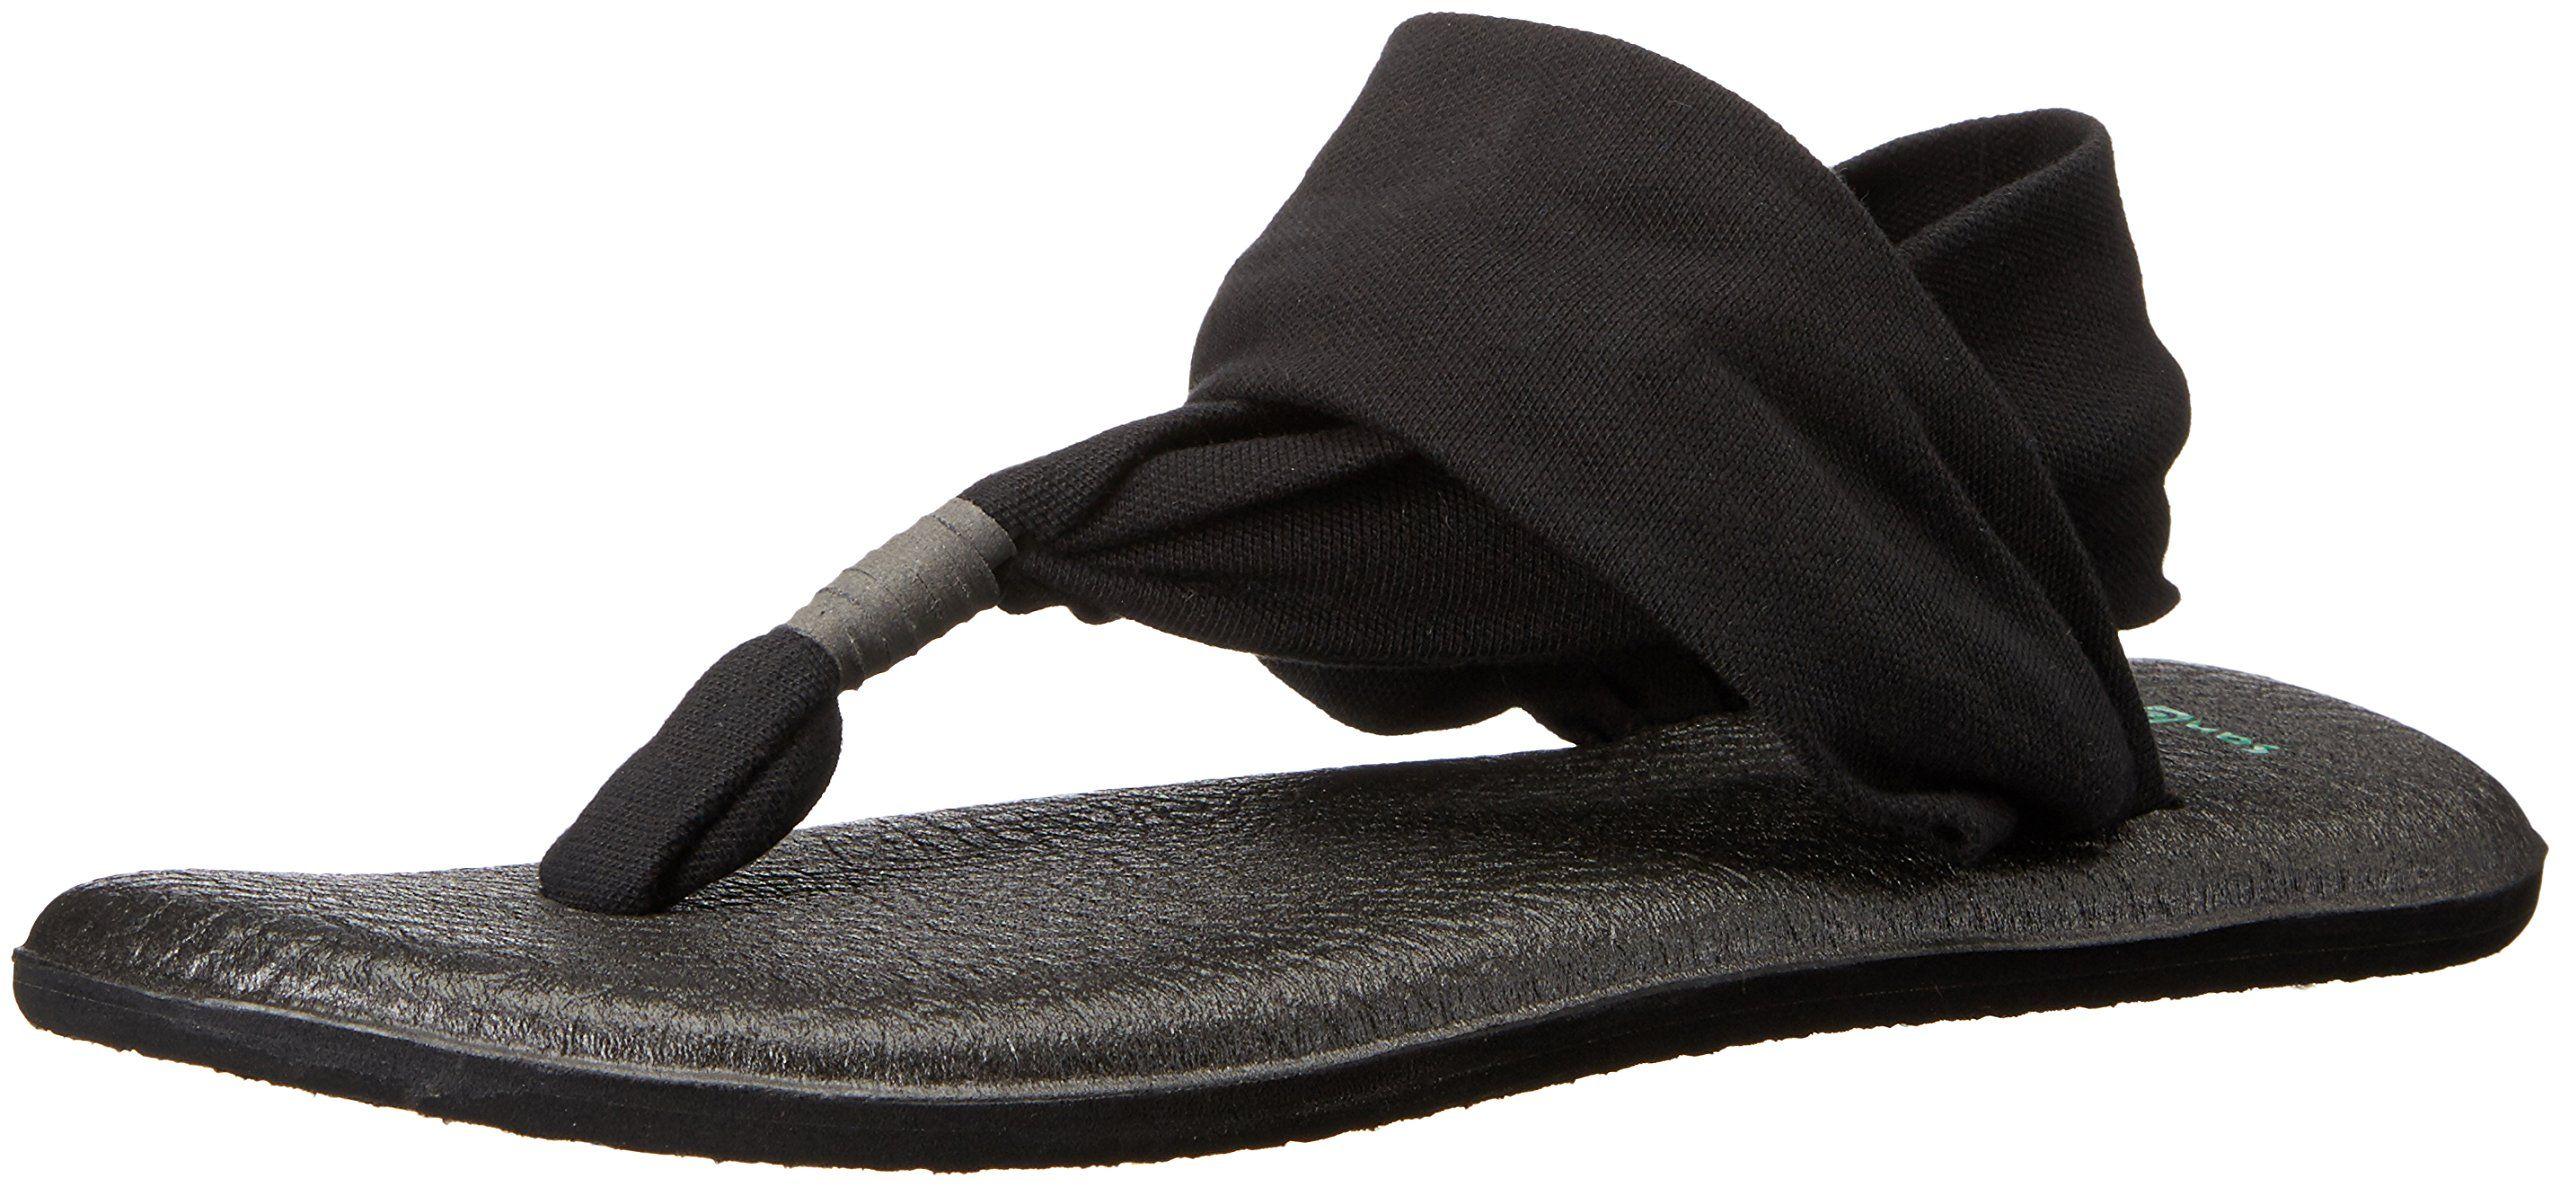 Wide Foot Tammie, Sandales Bout Ouvert Femme, Noir (Black 1), 37 EUNew Look